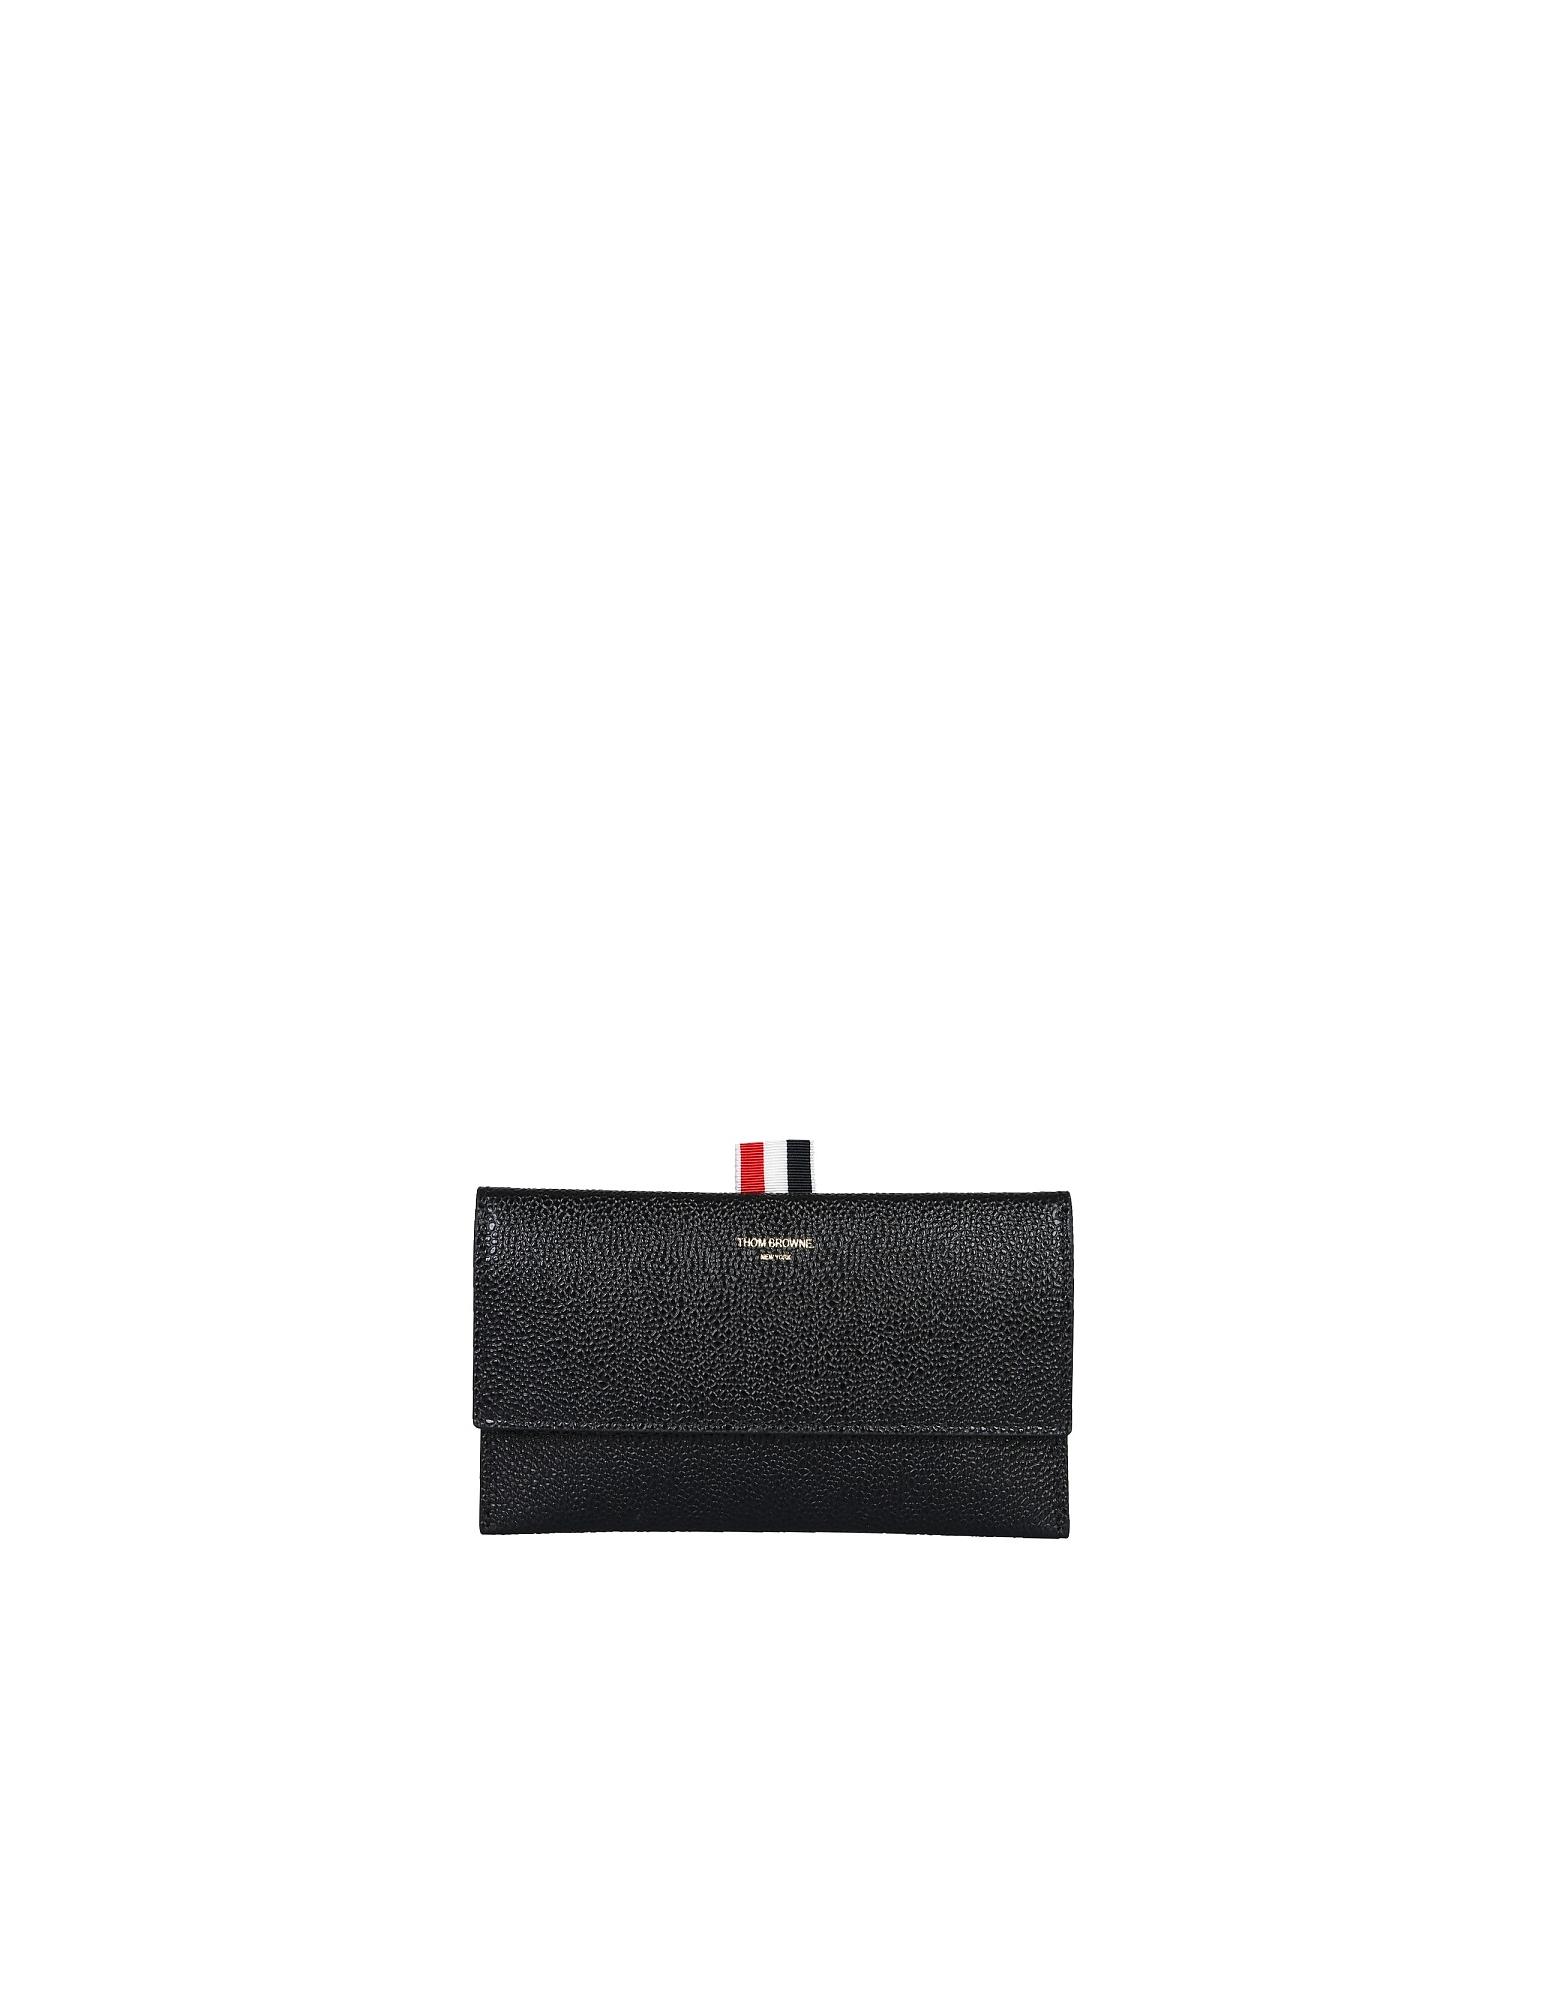 Thom Browne Designer Wallets, Wallet With Flap